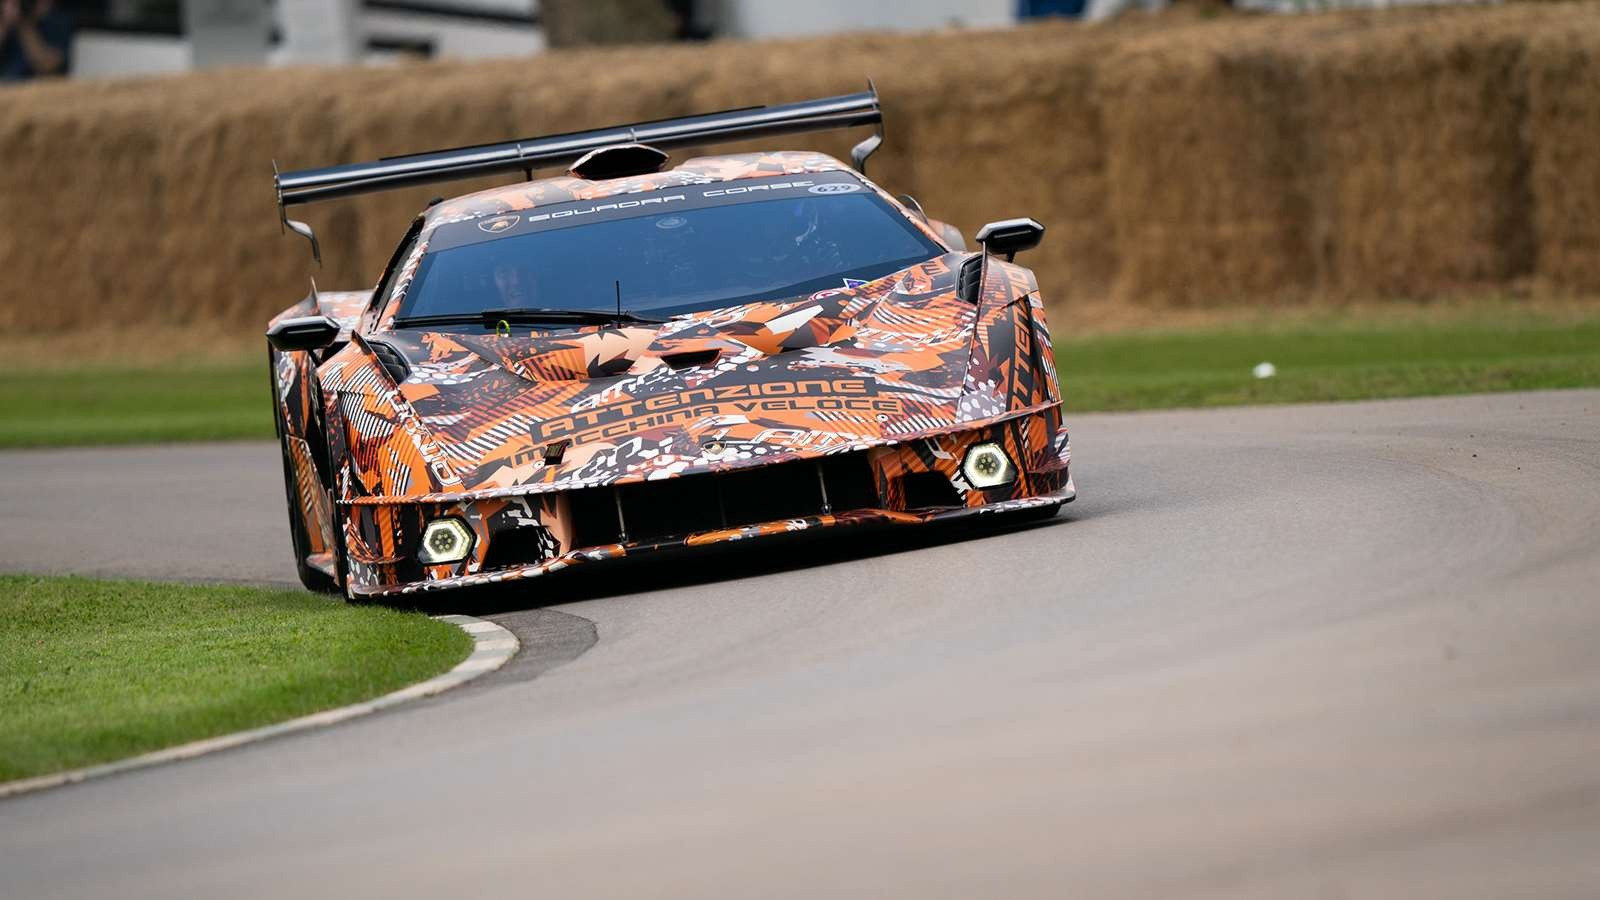 Nhung sieu xe noi bat tai Goodwood Festival of Speed 2021 anh 7